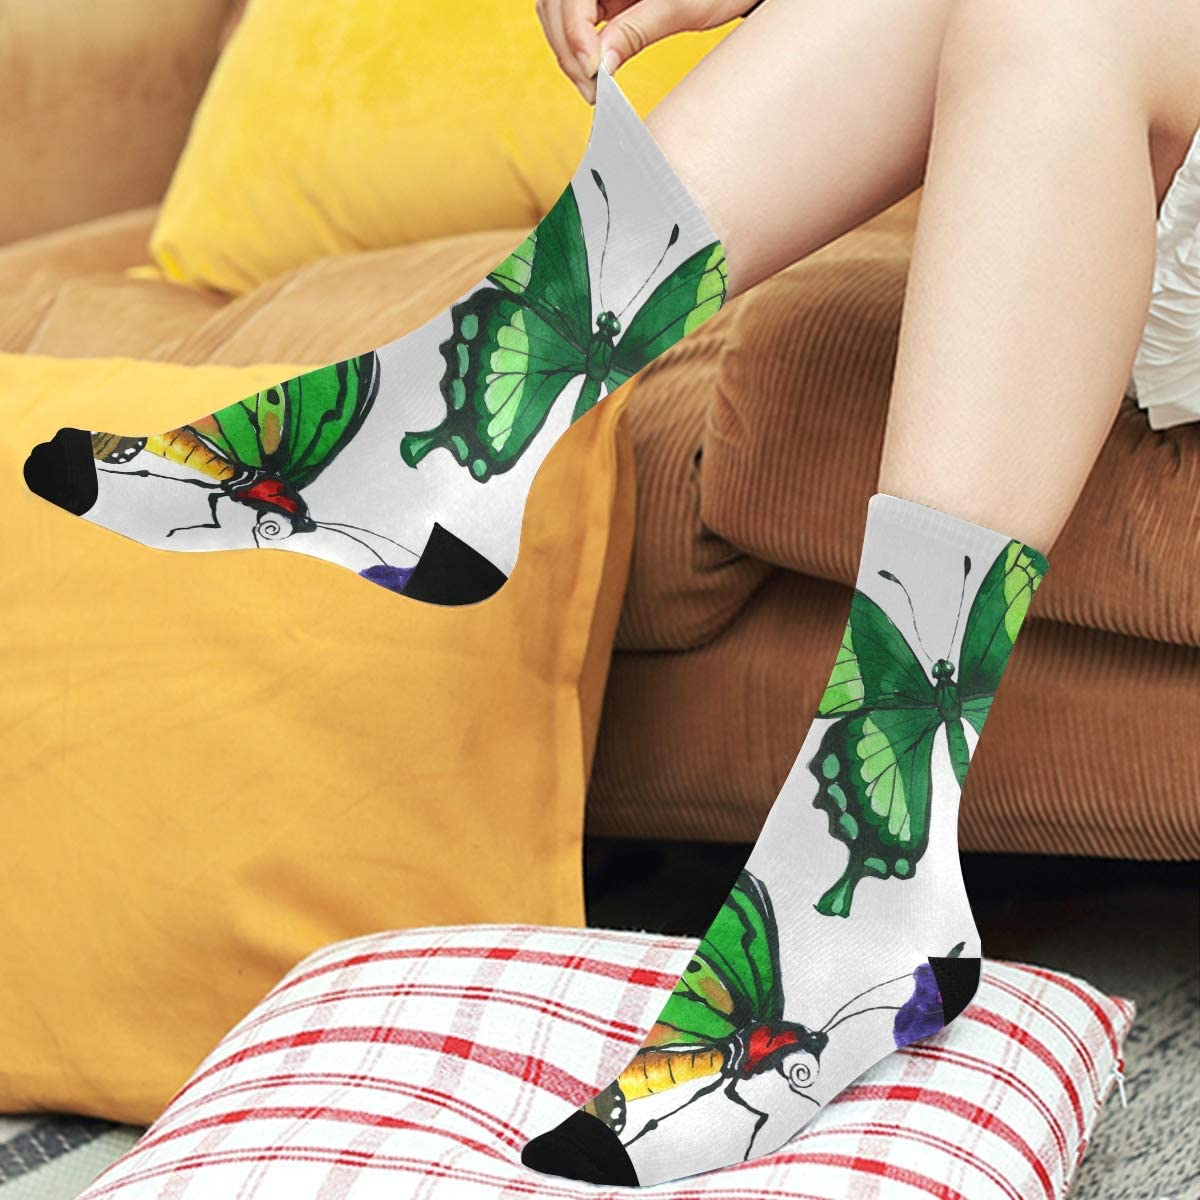 Butterflies on Blue Unisex Novelty Ankle Socks Adult Size 6-11